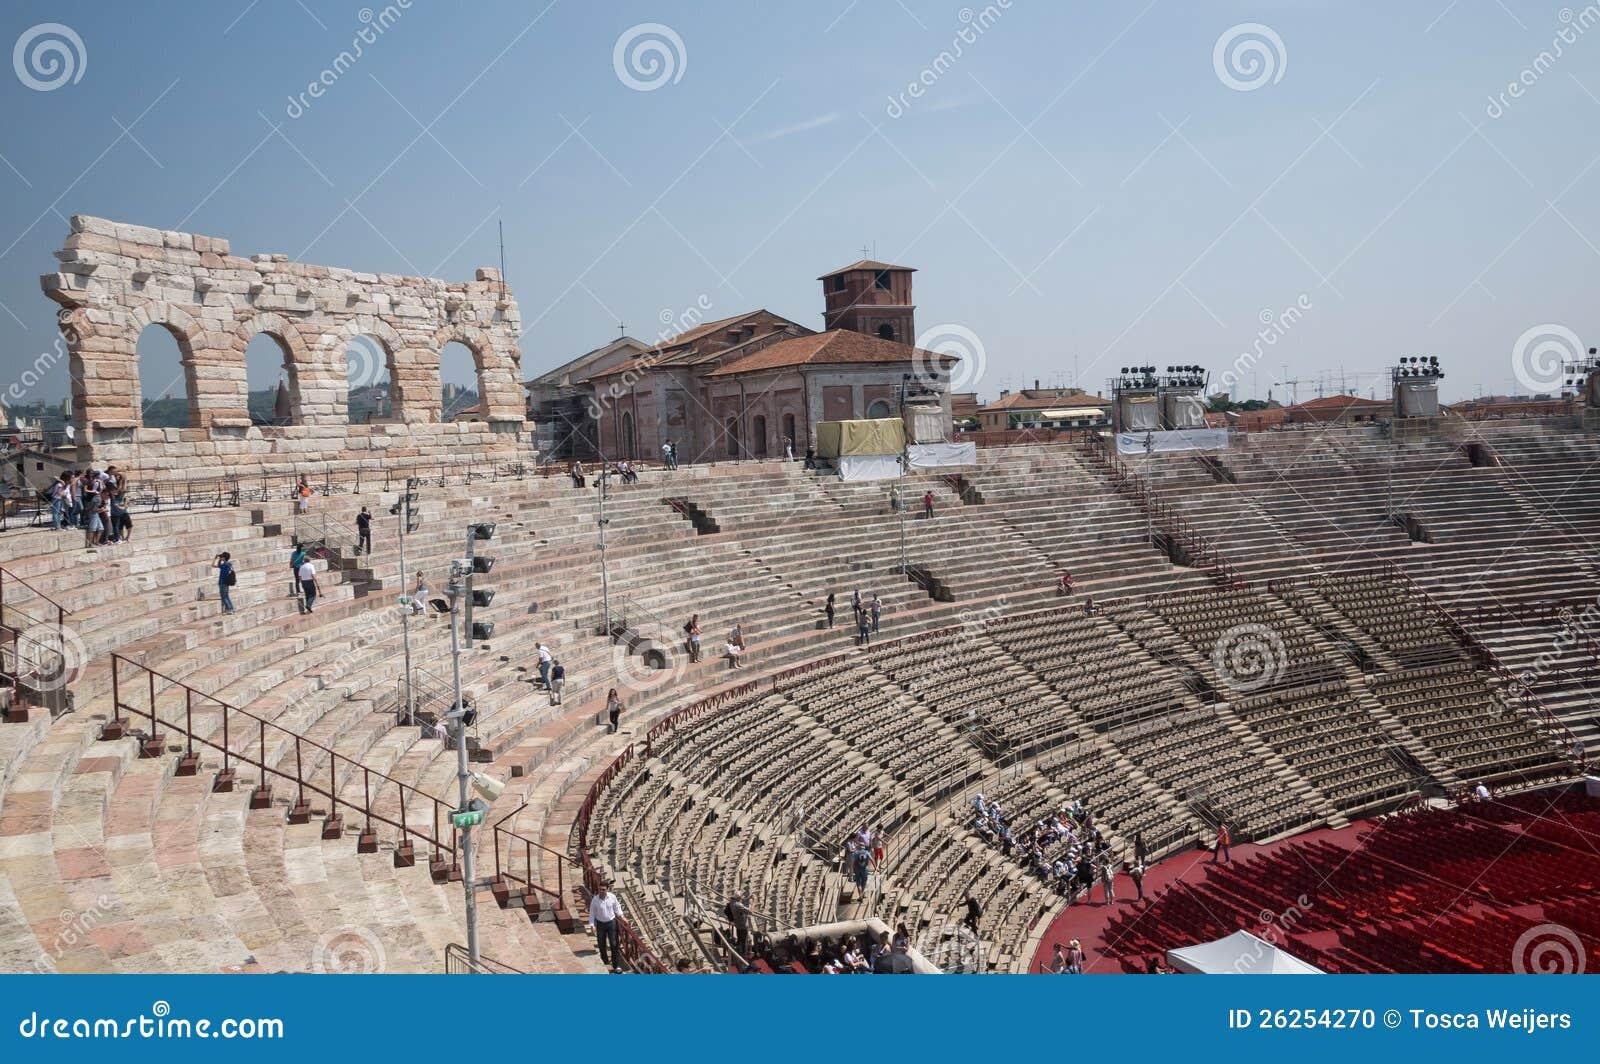 Arena Di Verona Stock Photo - Image: 26254270